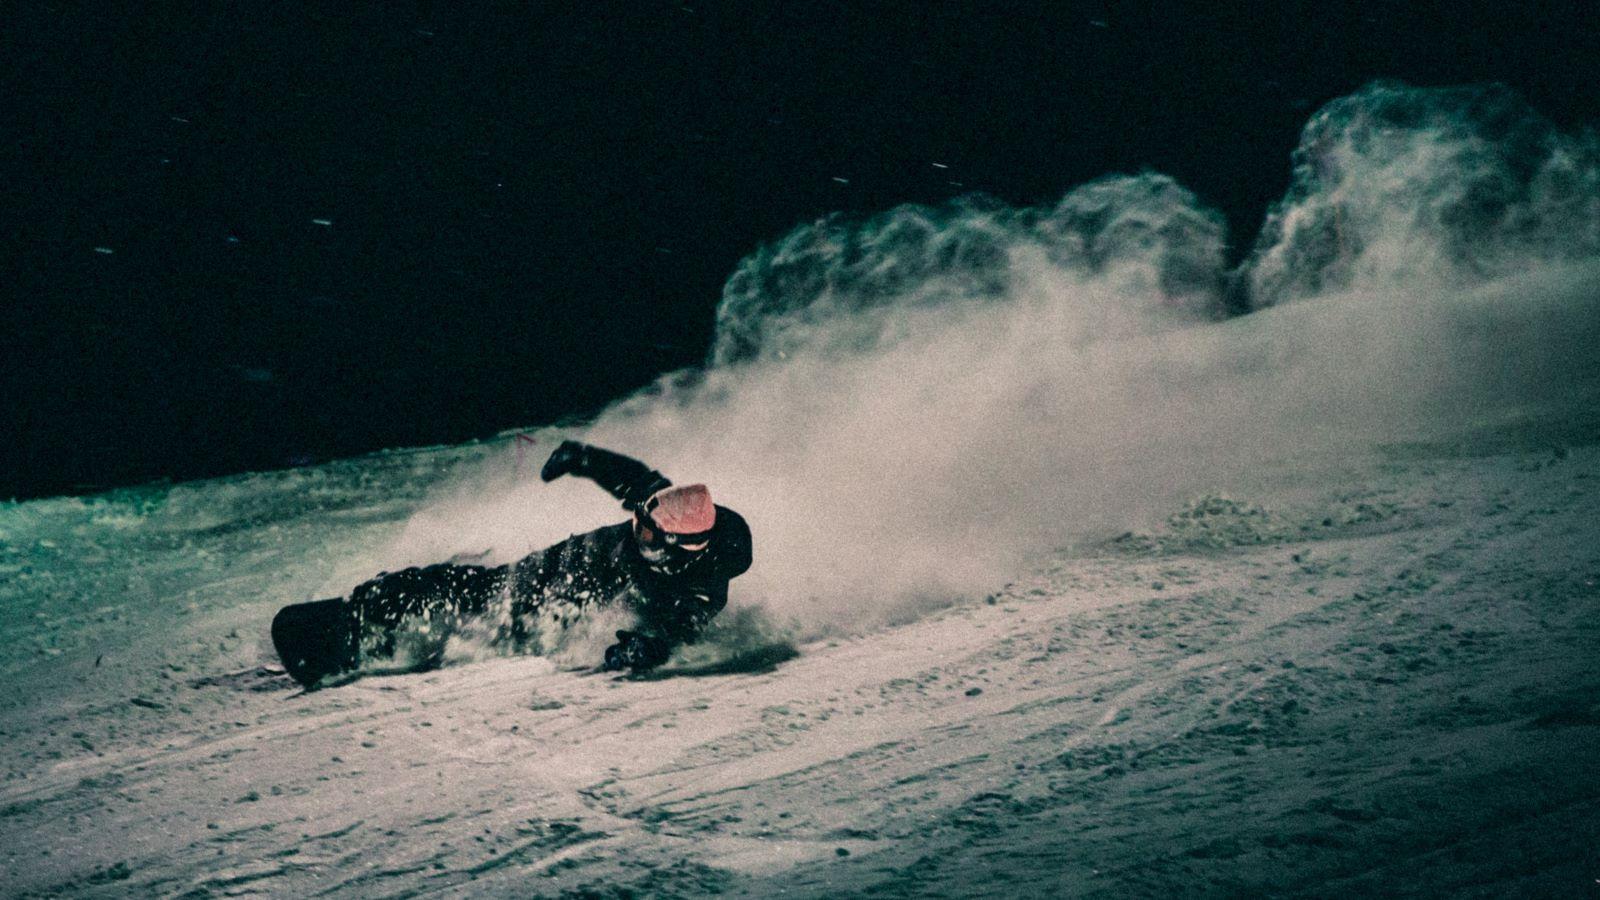 Island Snowboards